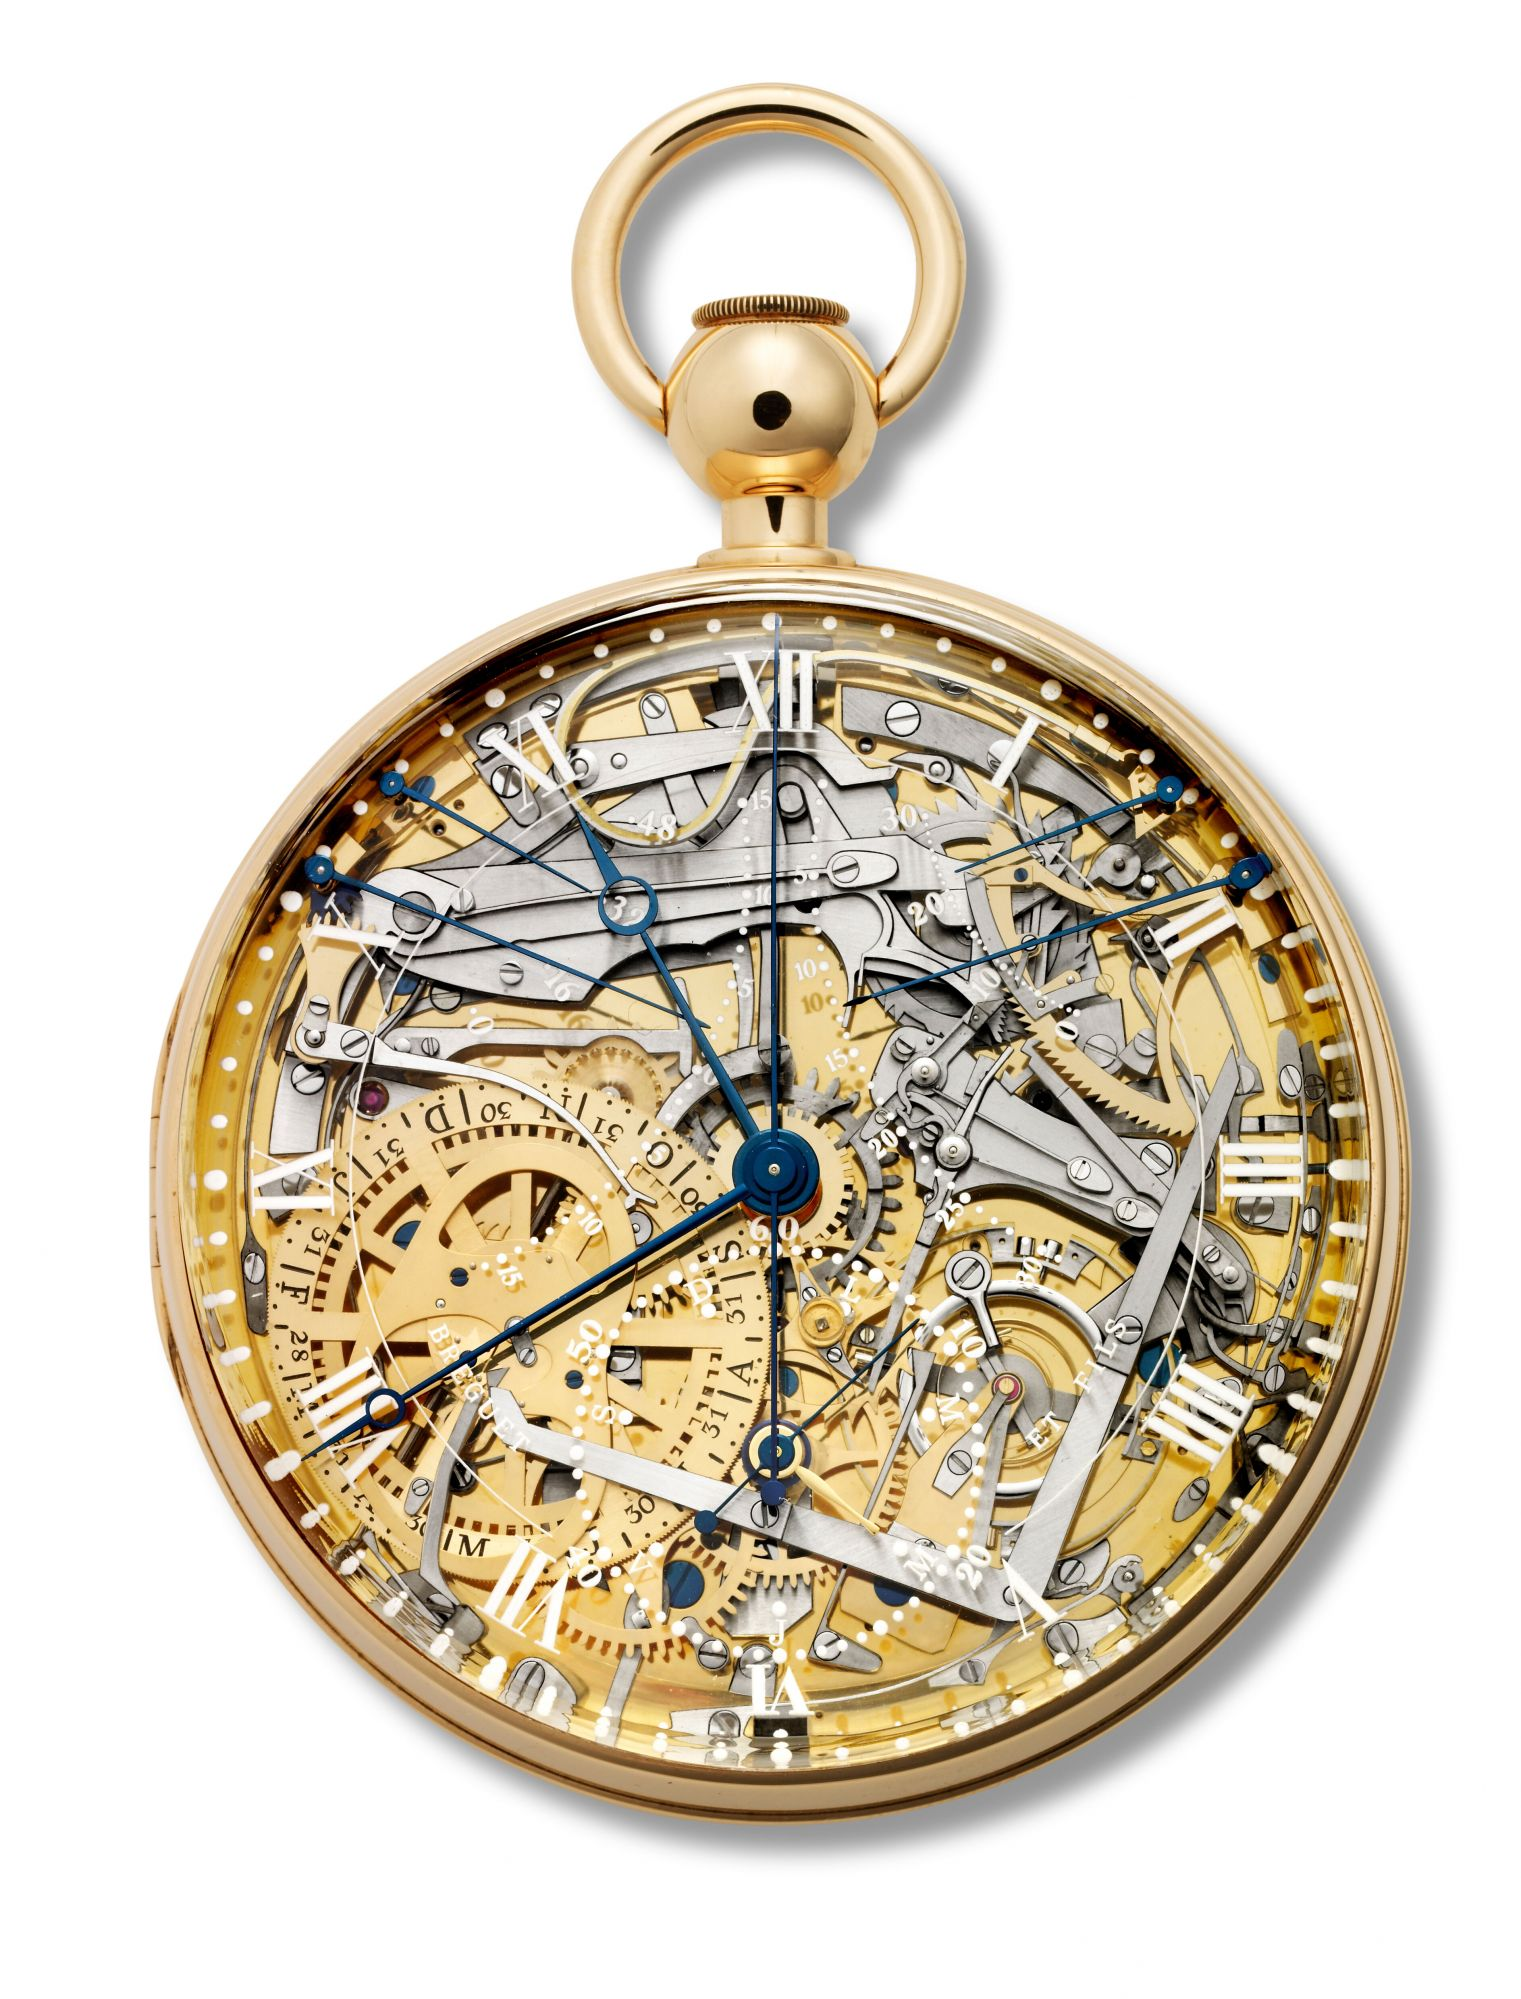 Breguet新款No.1160瑪麗‧安東尼懷錶。